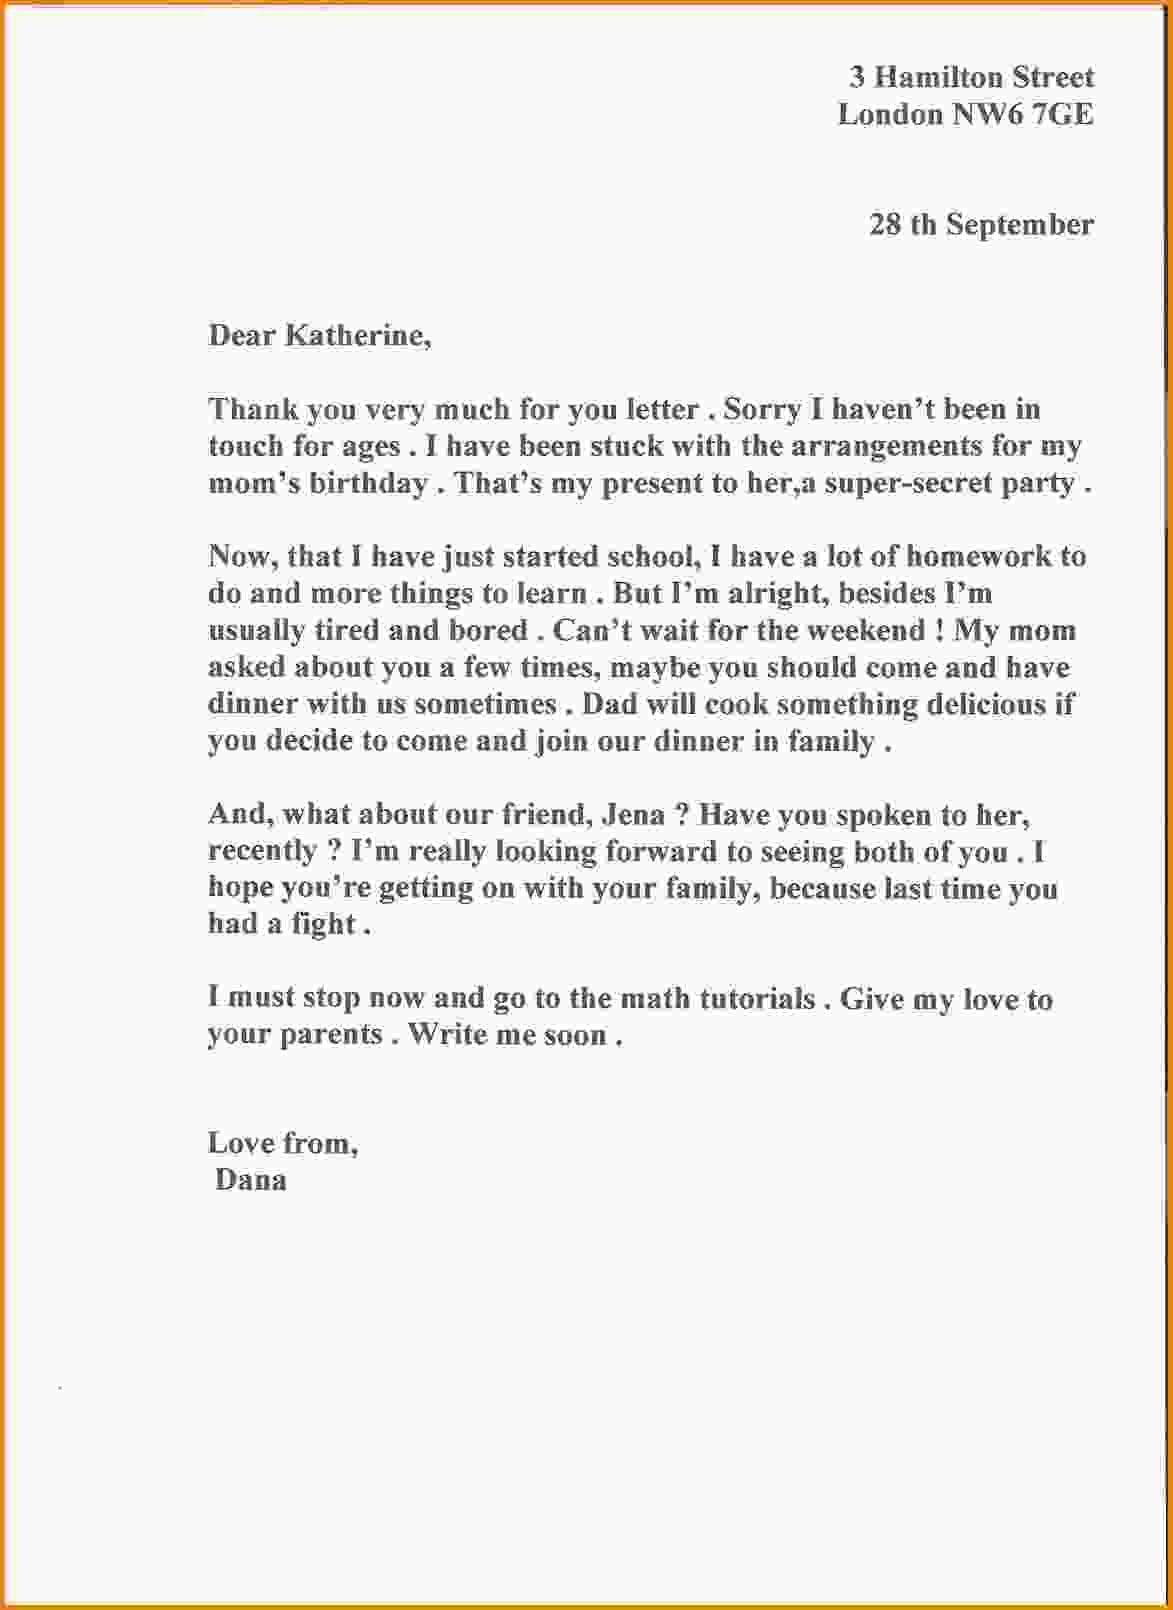 Informal letter format template uploaded kirei syahira home informal letter format template uploaded kirei syahira spiritdancerdesigns Image collections